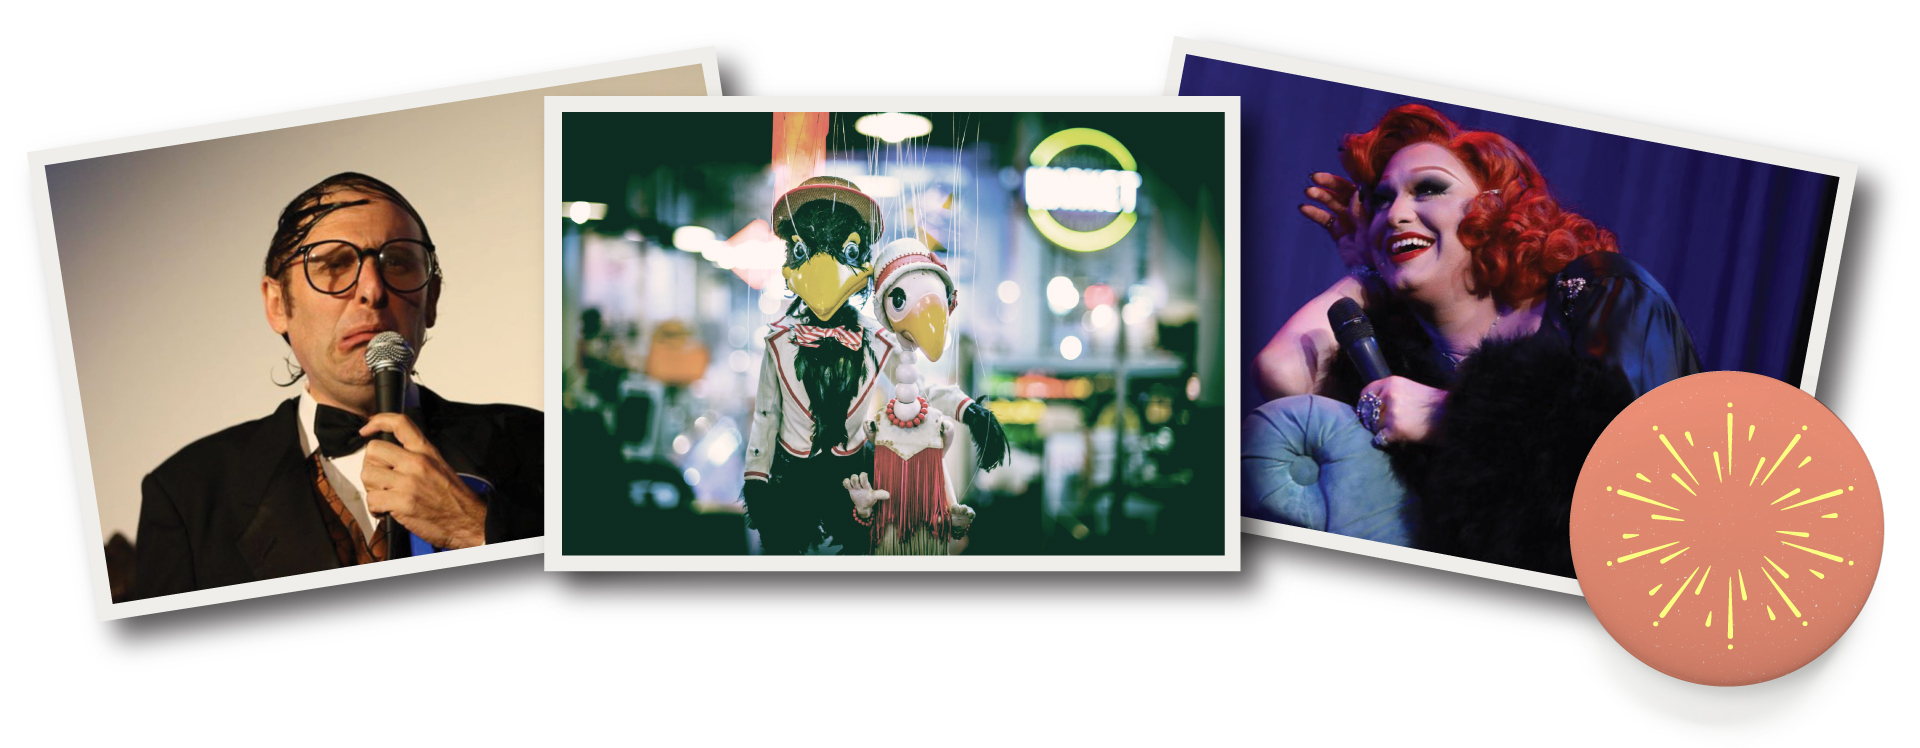 From Left to Right: Neil Hamburger, Bob Baker Marionettes, Jinkx Monsoon.